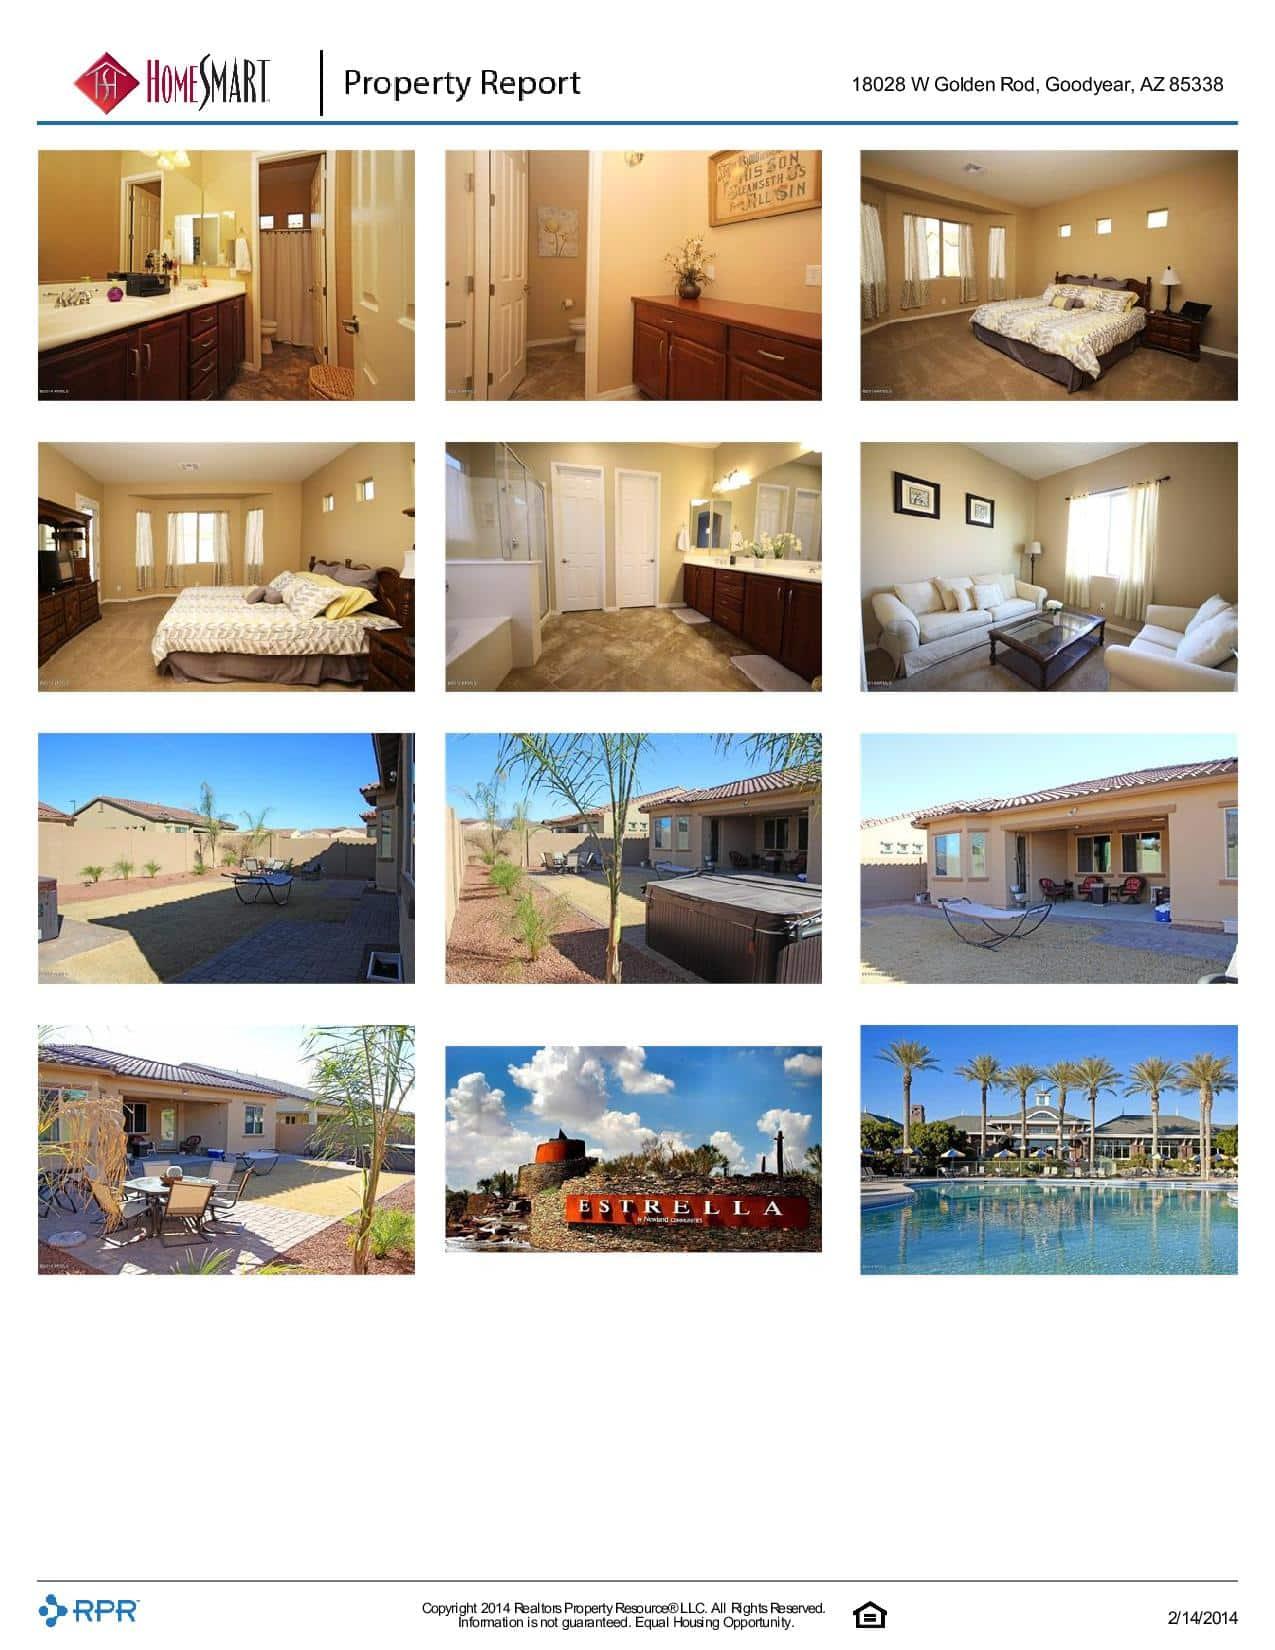 18028-W-Golden-Rod-Goodyear-AZ-85338-page-006